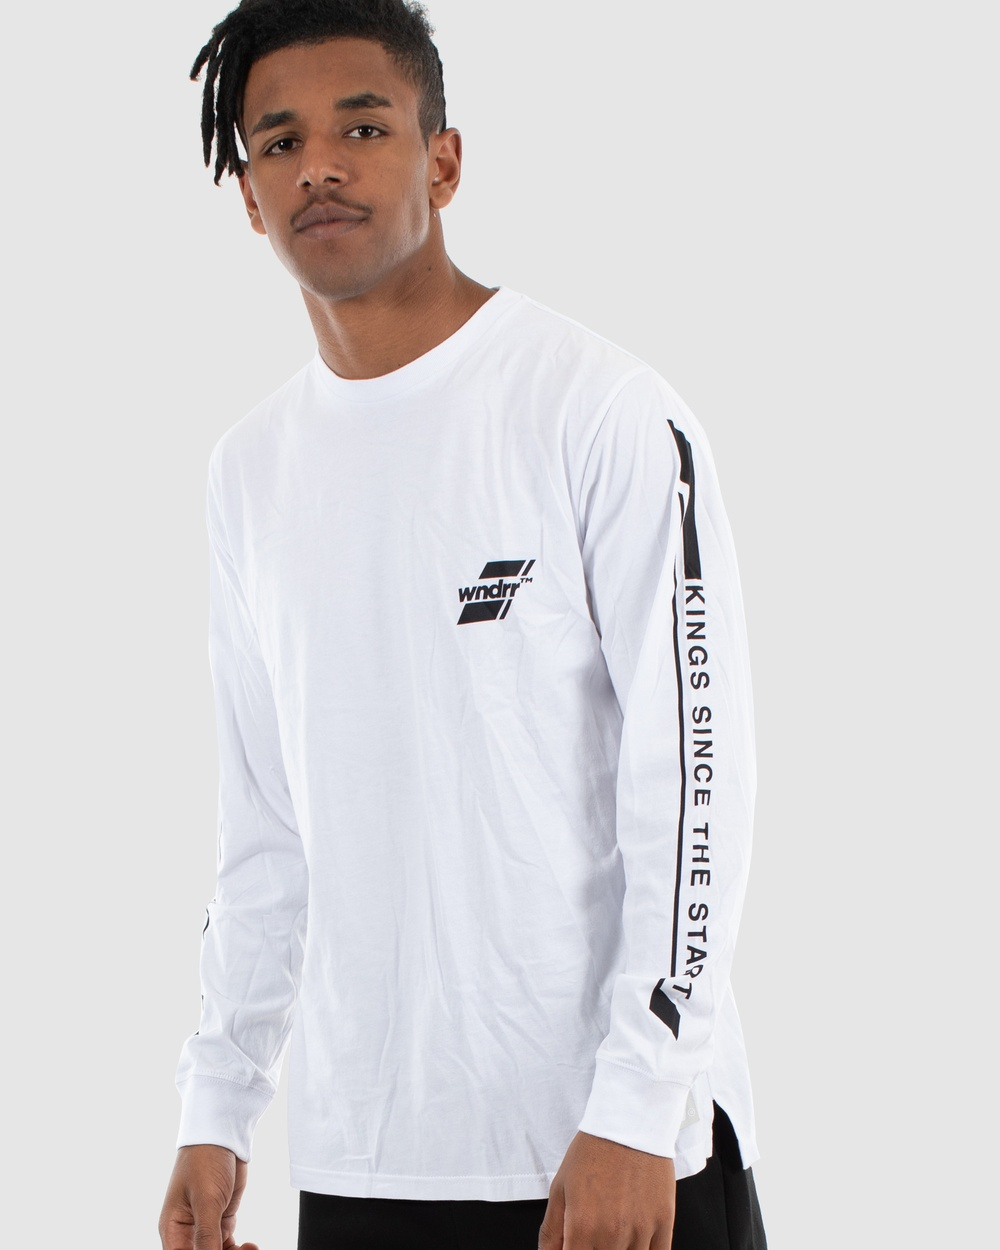 WNDRR - Across Long Sleeve Tee - Long Sleeve T-Shirts (White) Across Long Sleeve Tee